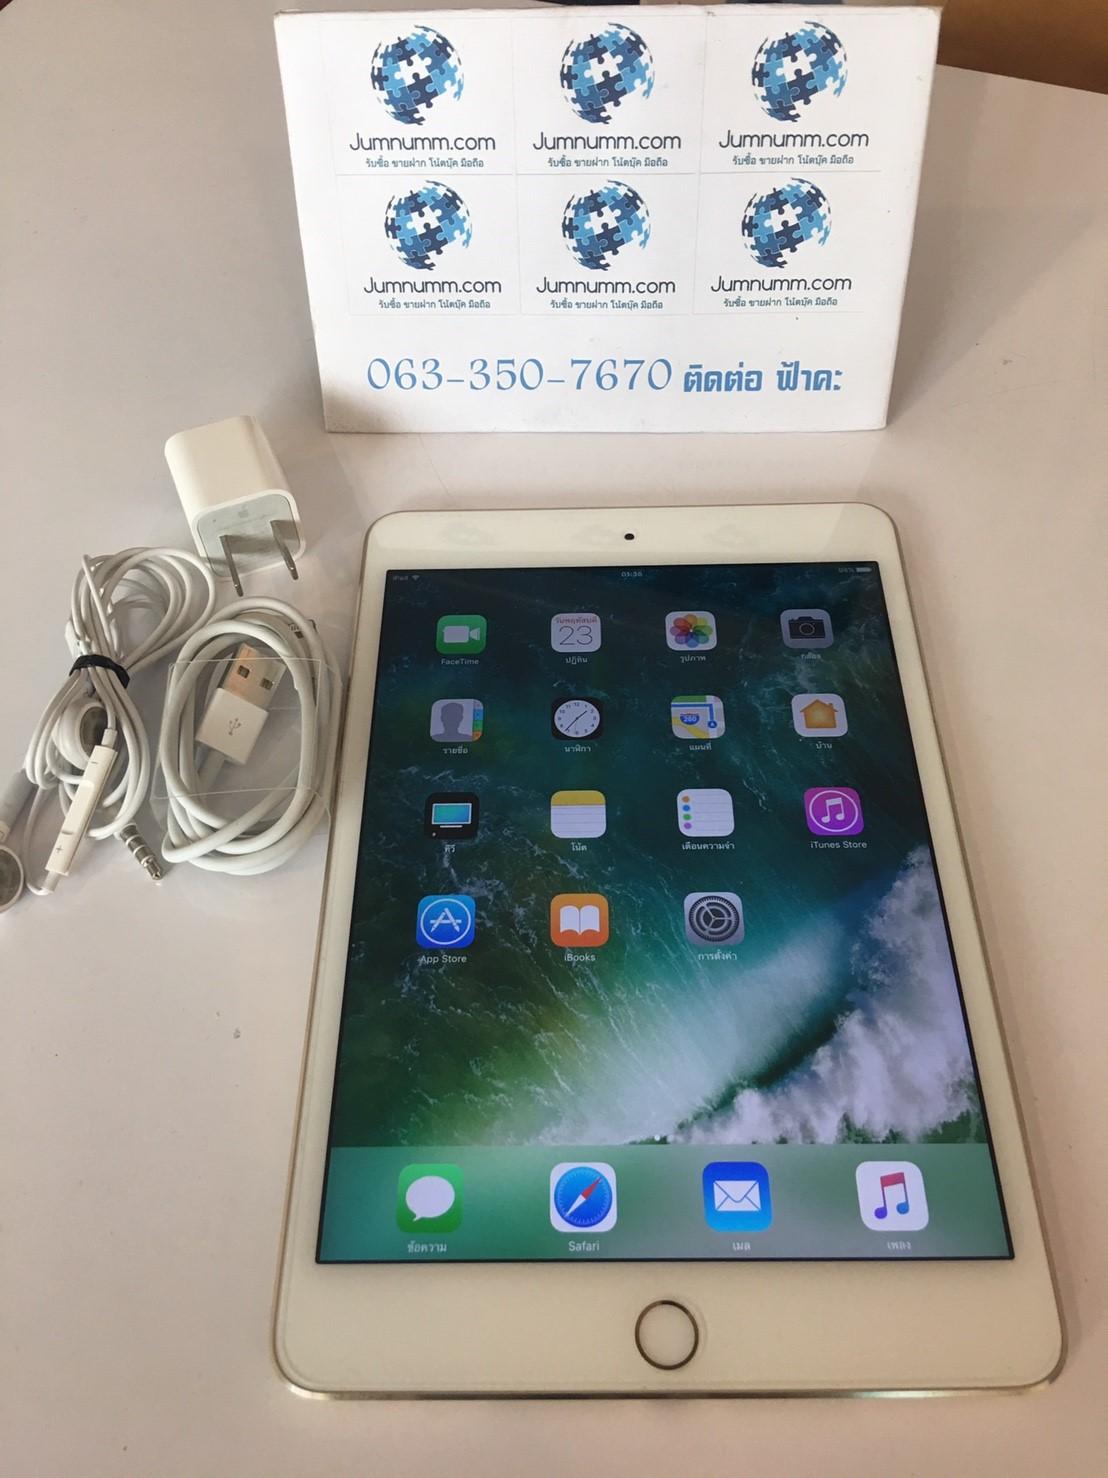 JMM-10 IPad Mini4 64GB Wifi Gold สภาพนางฟ้า ราคา 10500 บาท ประกันเหลือถึง ส.ค 61